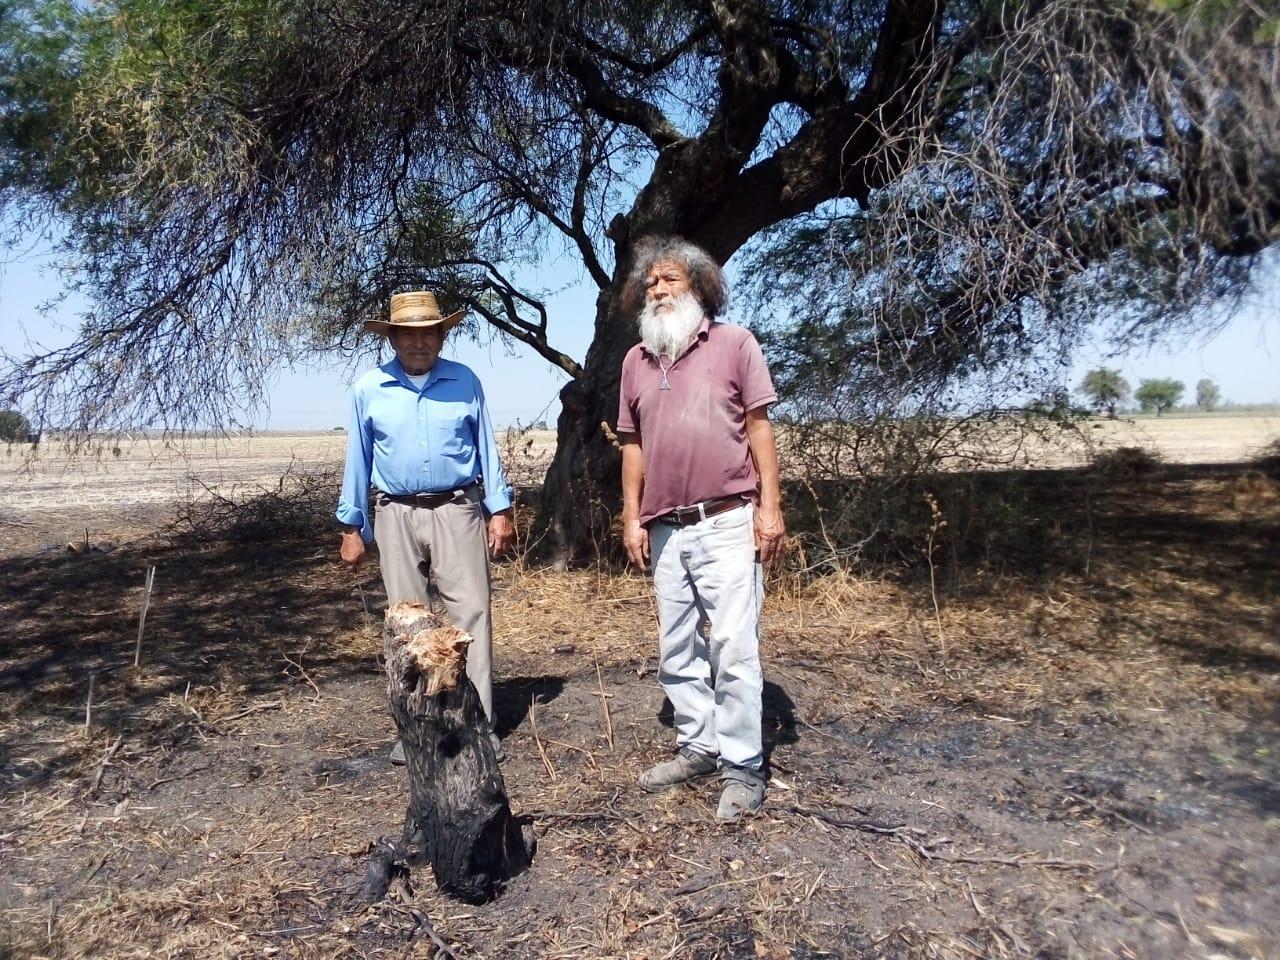 Irapuato: Ecologistas denuncian tala y quema de mezquites en reserva de San Agustín de Tordos